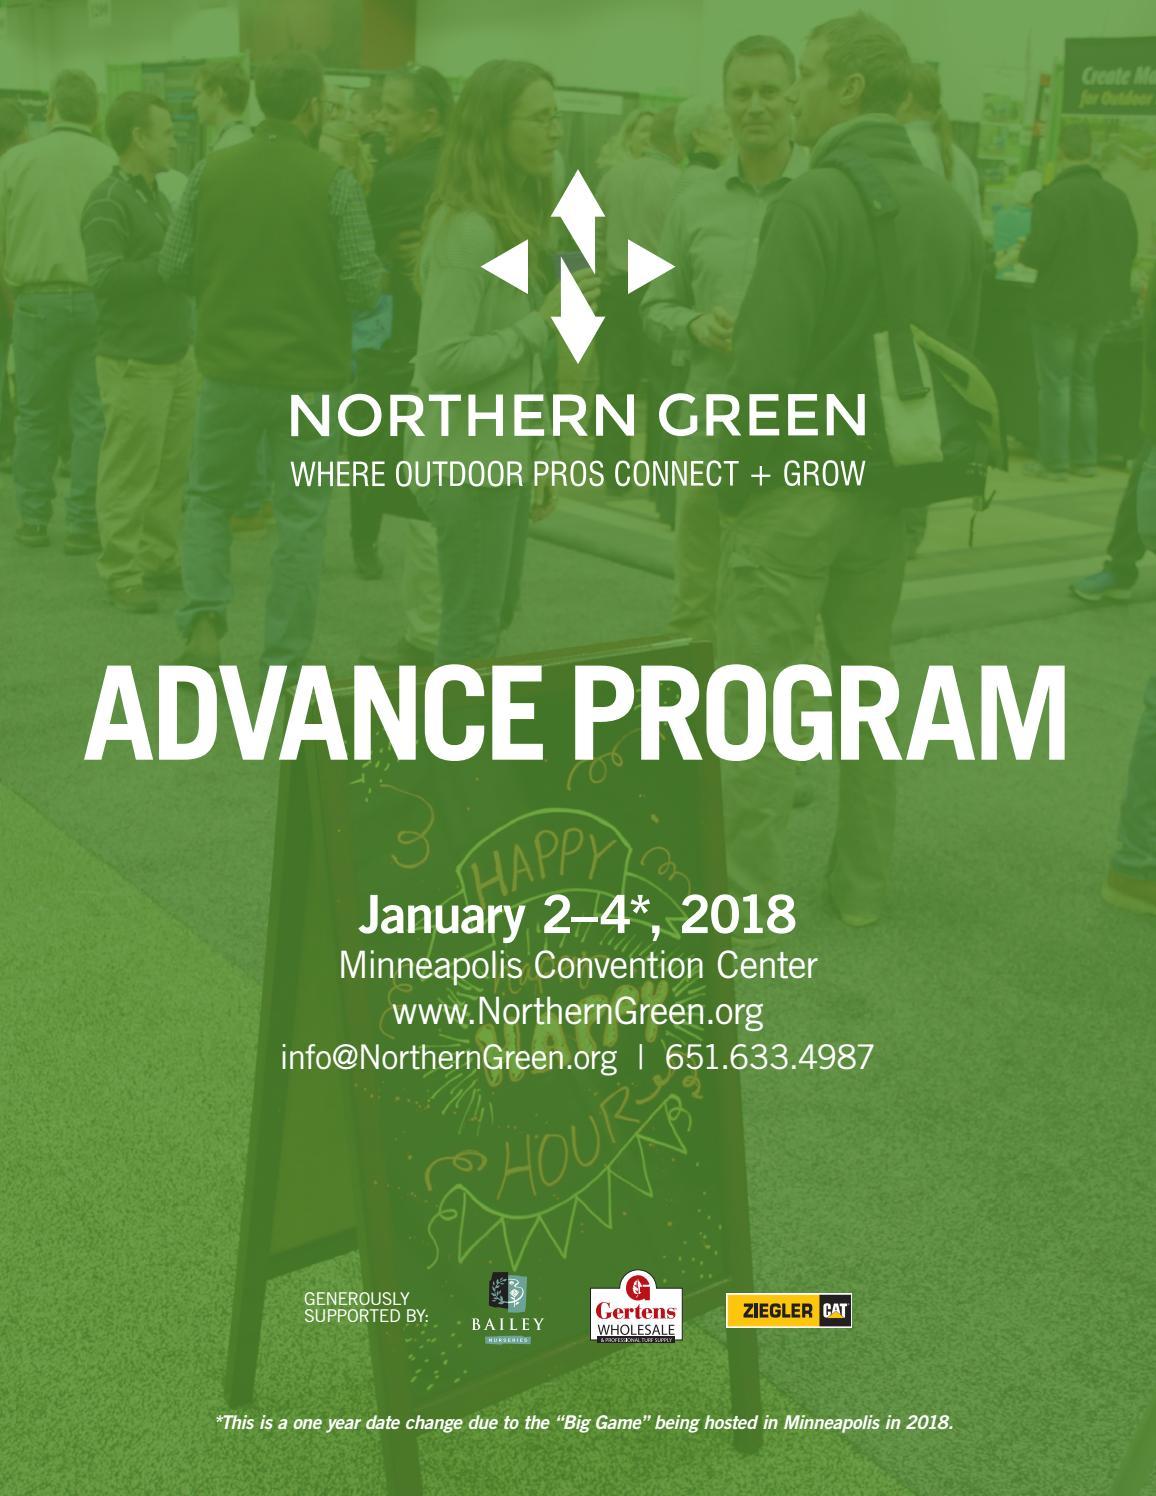 Northern Green 2018 Advance Program by Northern Green - issuu